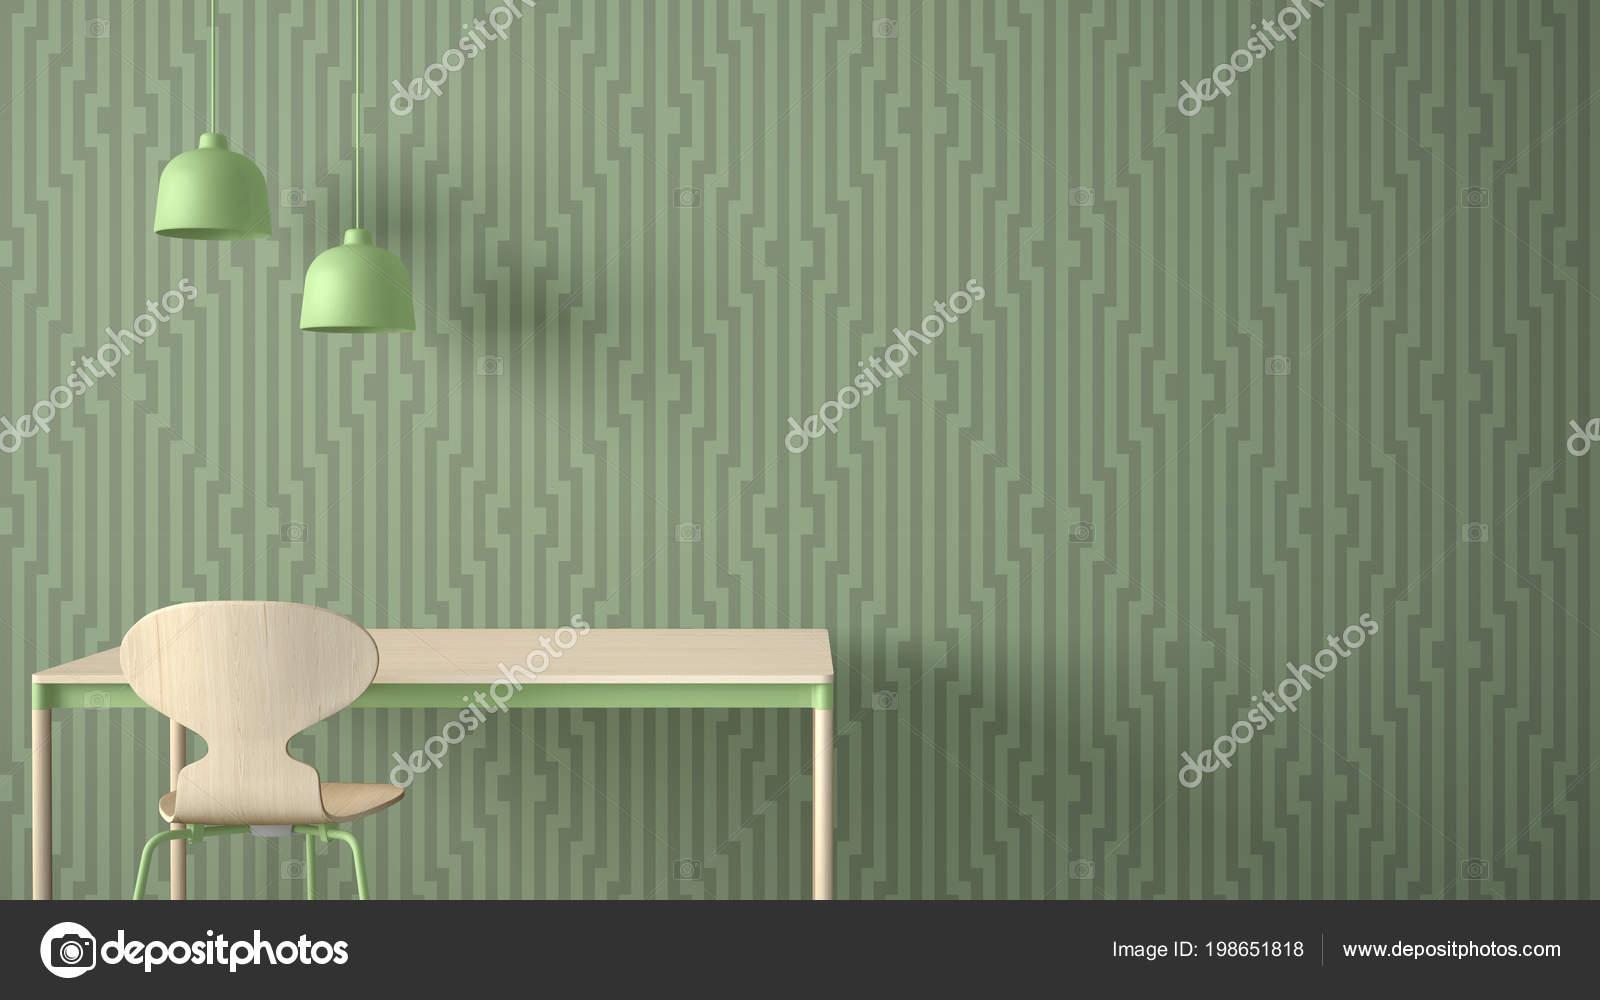 zinc kitchen table blue sink 简约的建筑师设计理念桌子和椅子厨房或办公室与灯具几何壁纸背景绿色粉彩 简约的建筑师设计理念桌子和椅子厨房或办公室与灯具几何壁纸